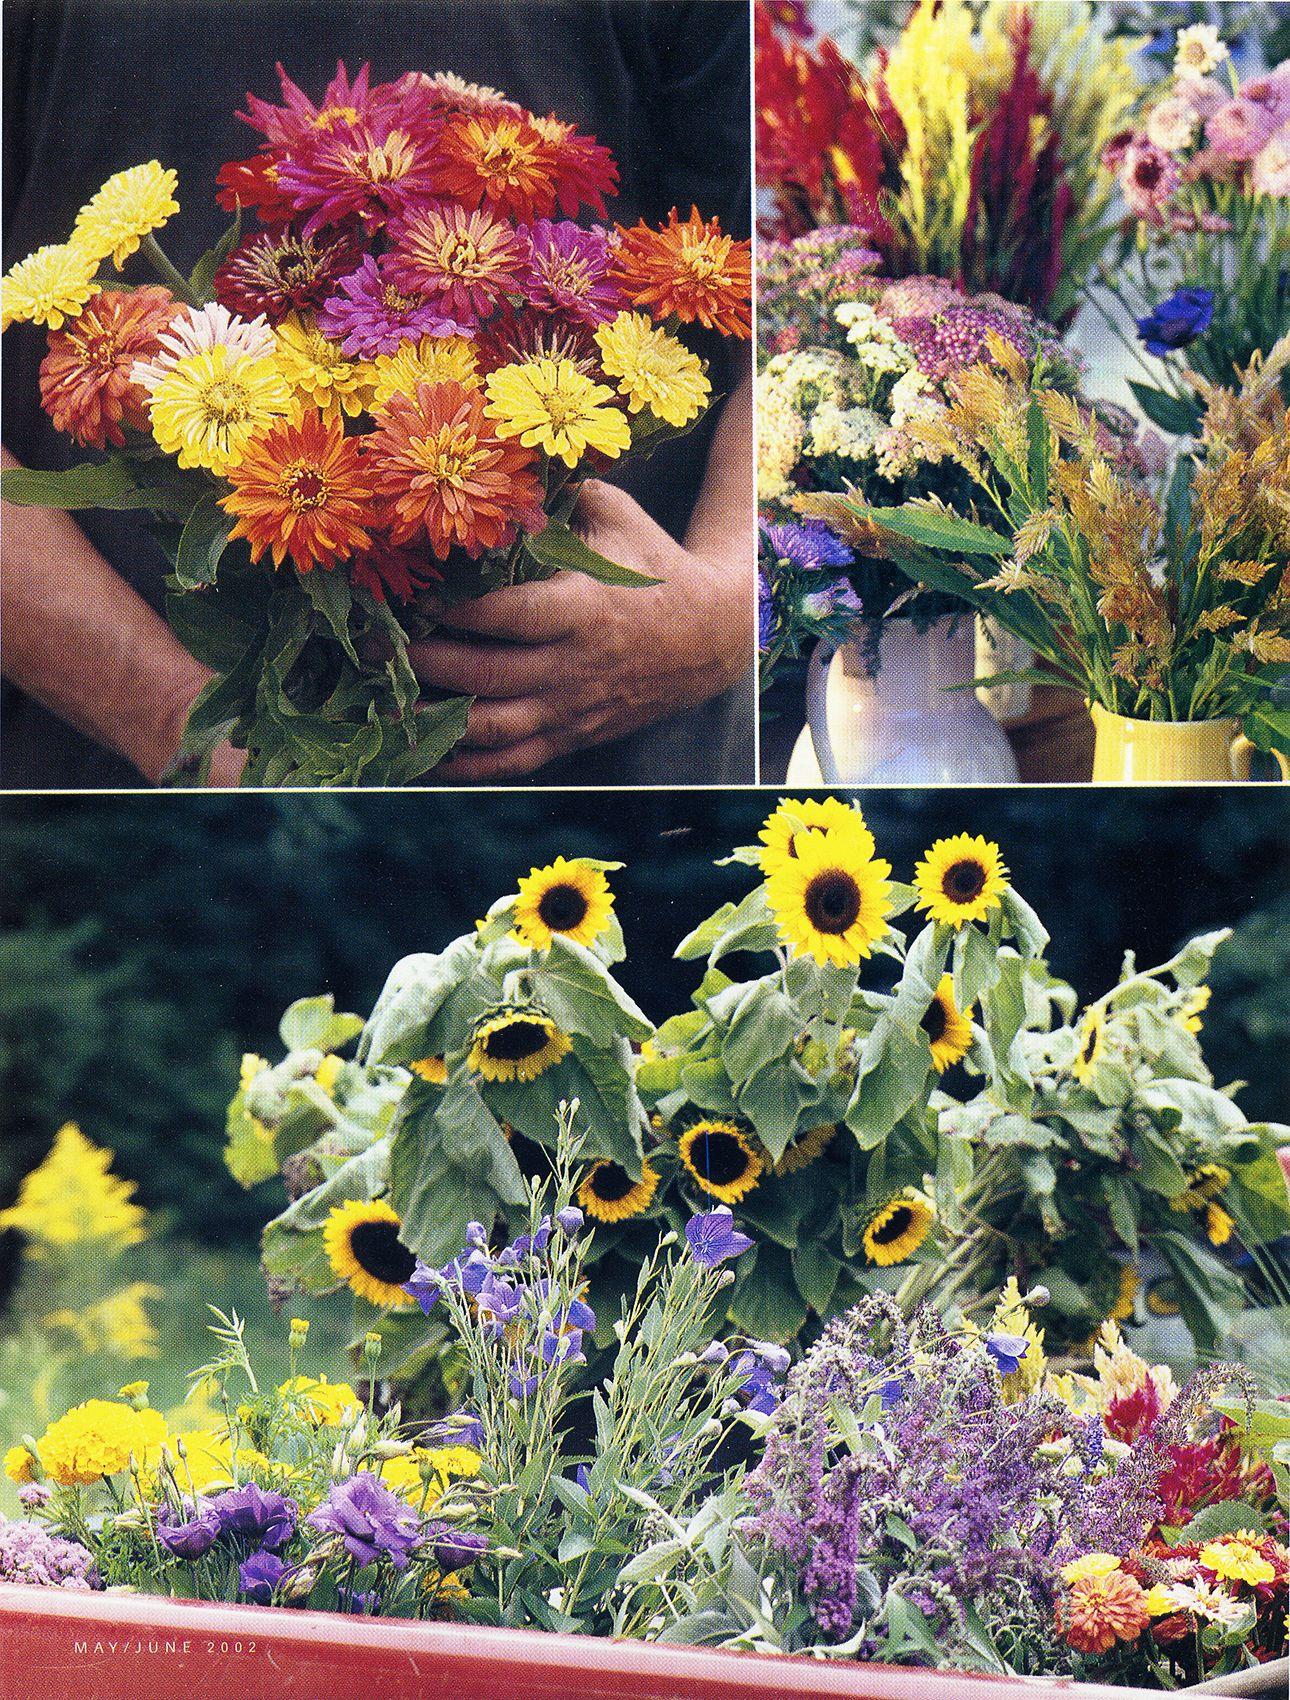 Horticulture-MayJune2002-1.jpg